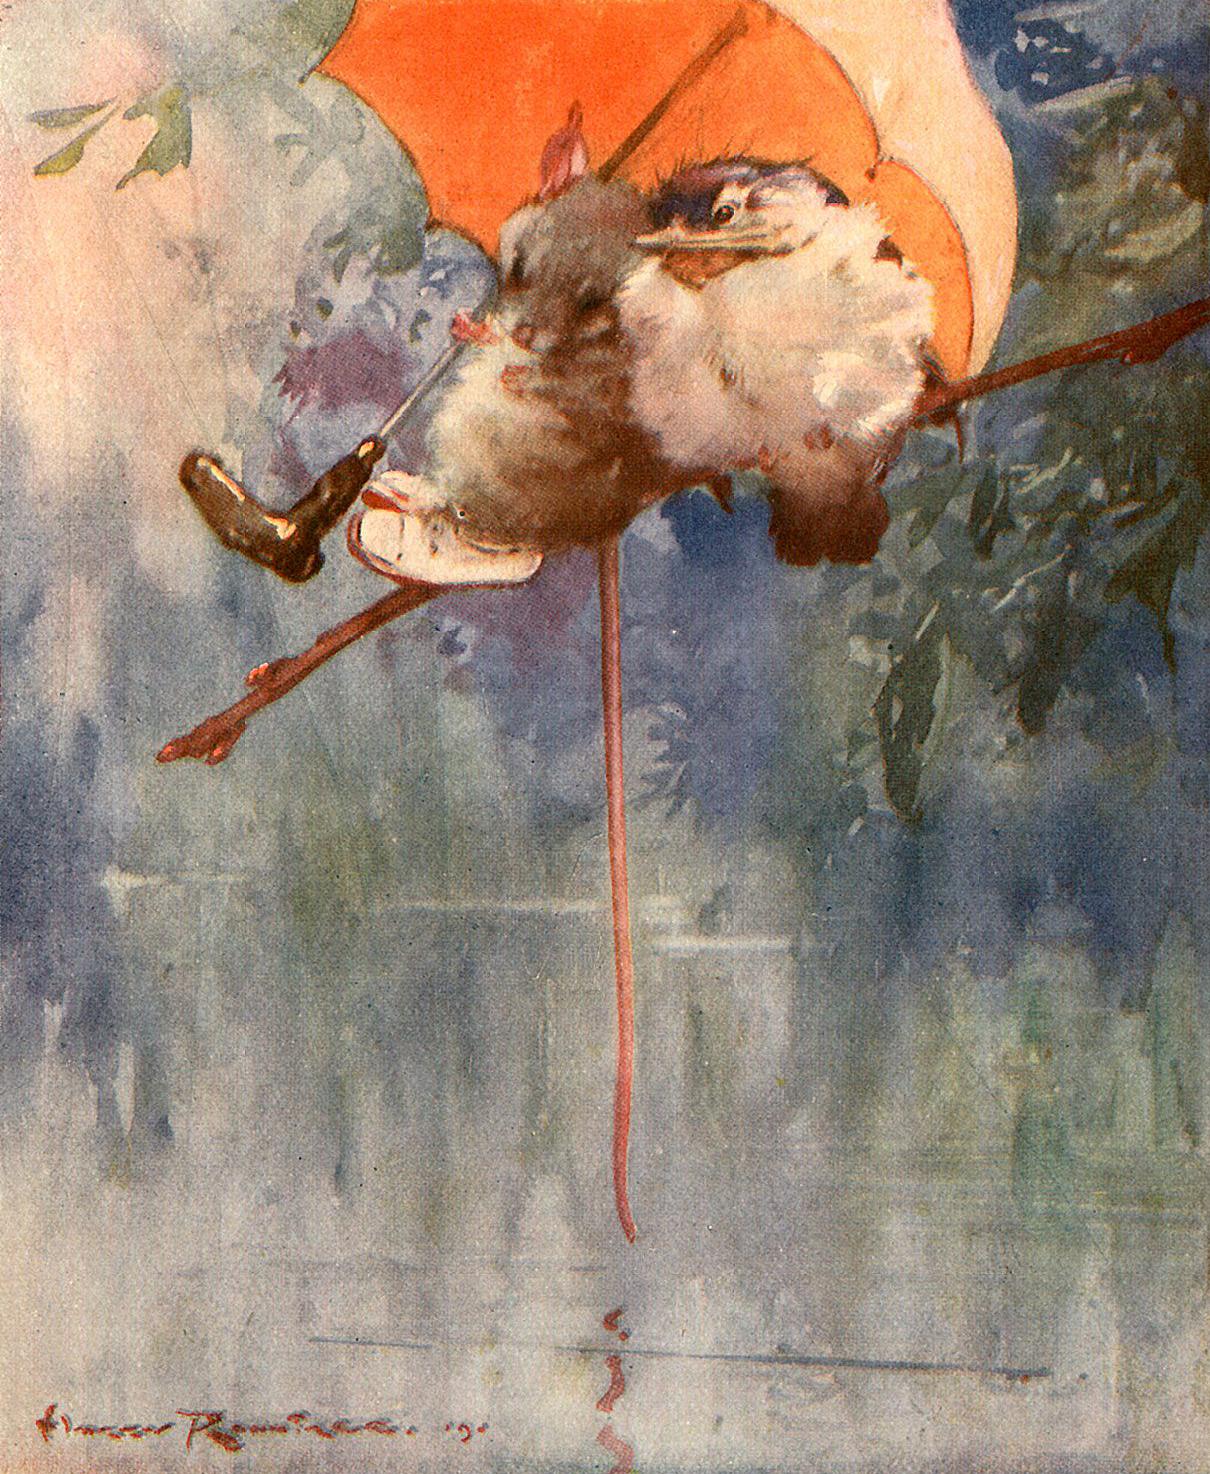 ART & ARTISTS: Harry Rountree